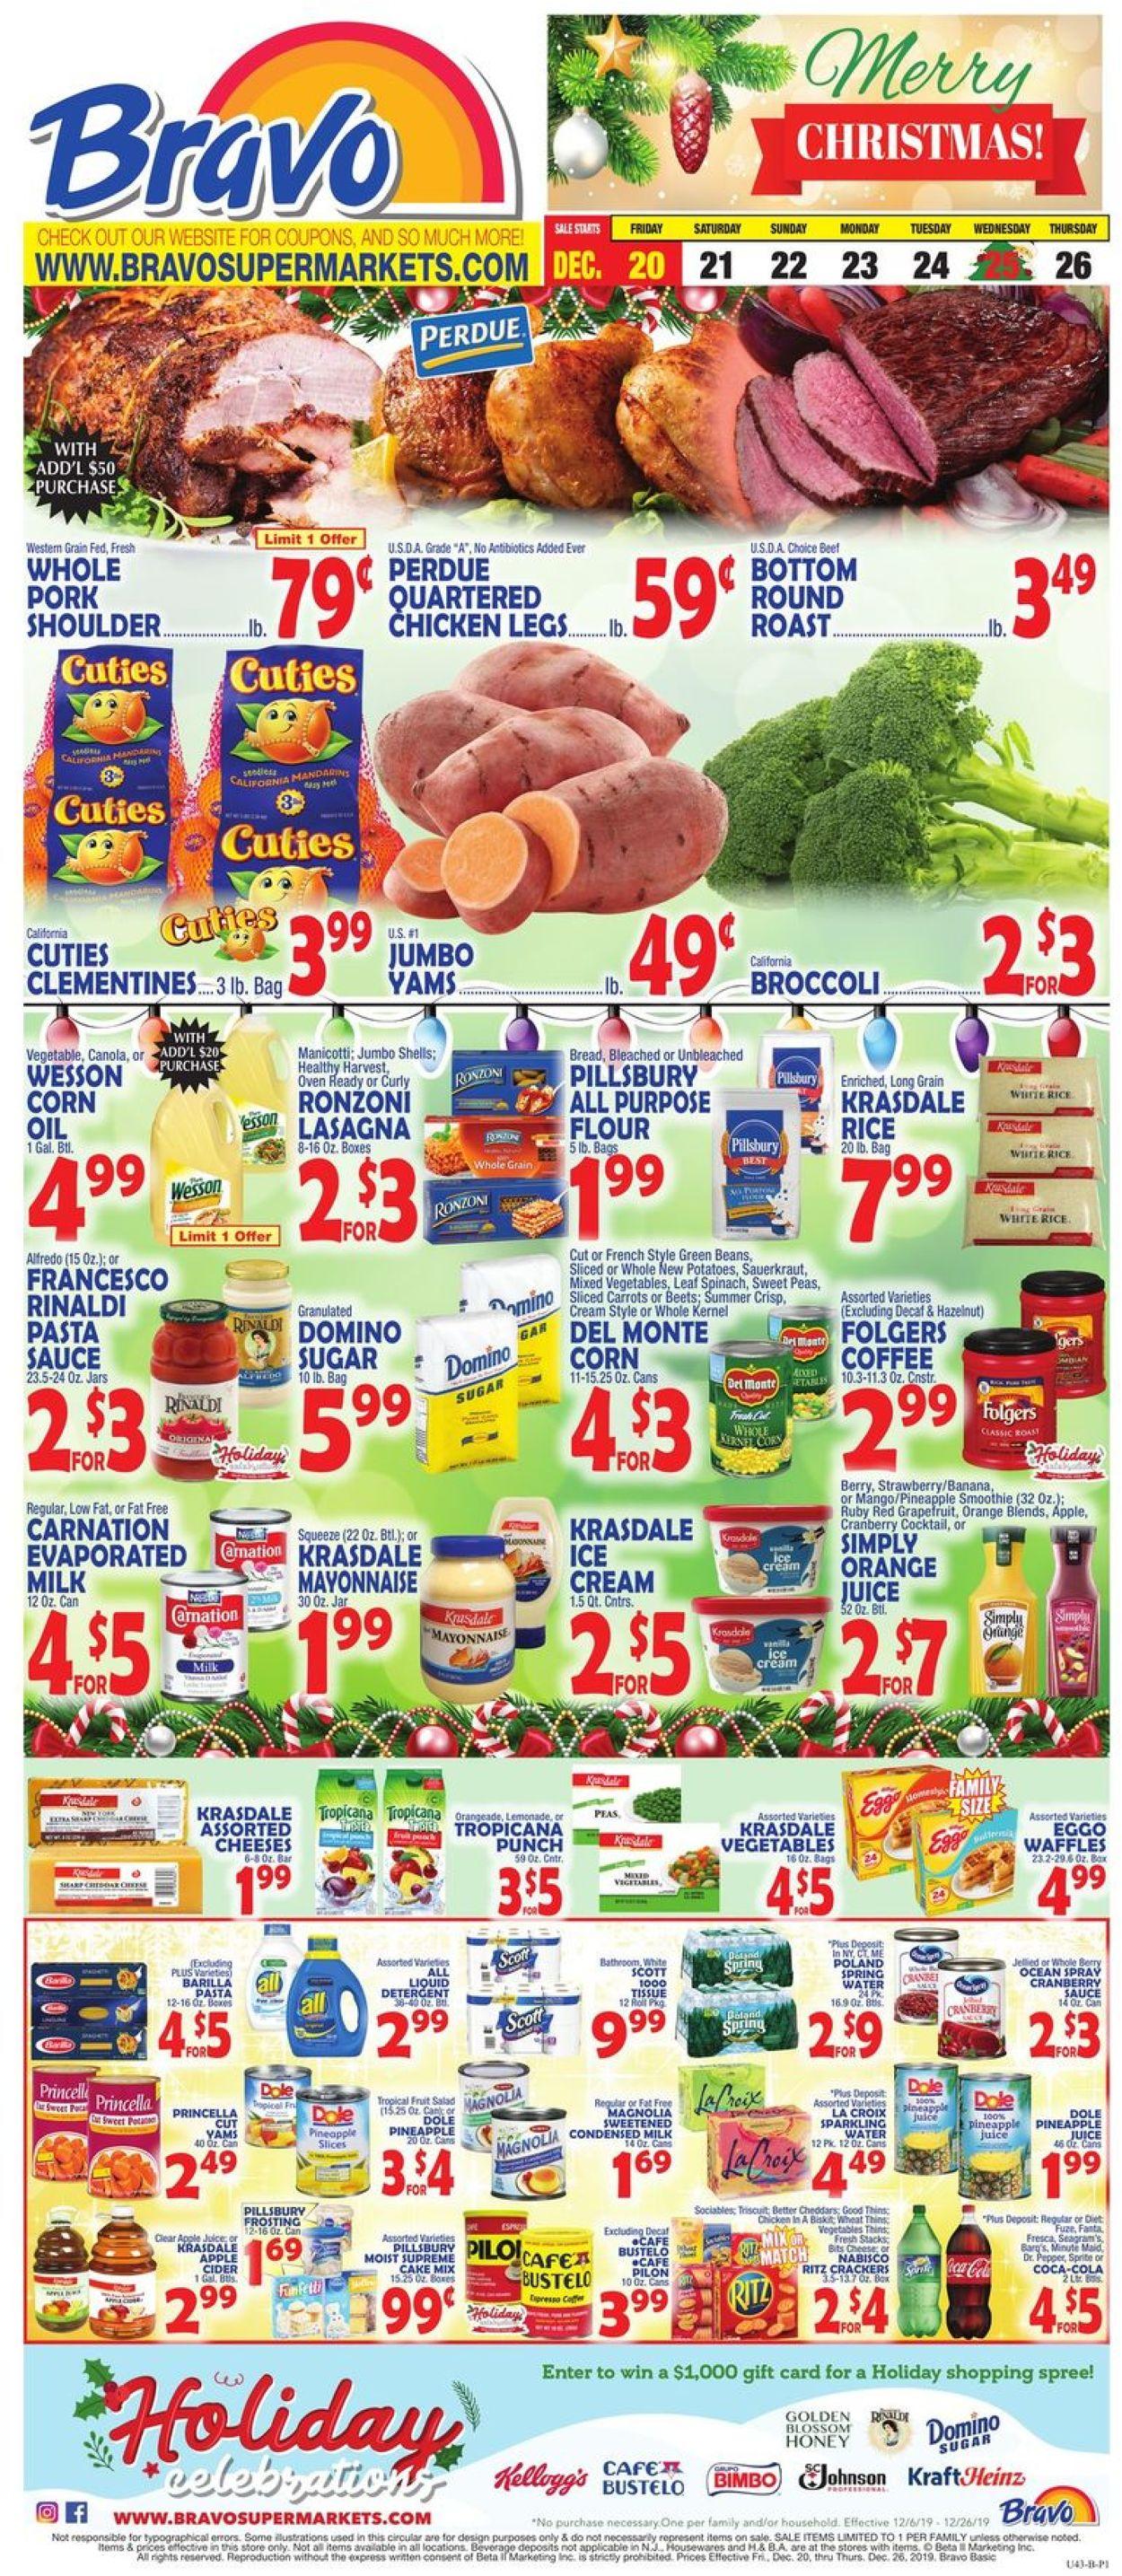 Catalogue Bravo Supermarkets - Christmas Ad 2019 from 12/20/2019